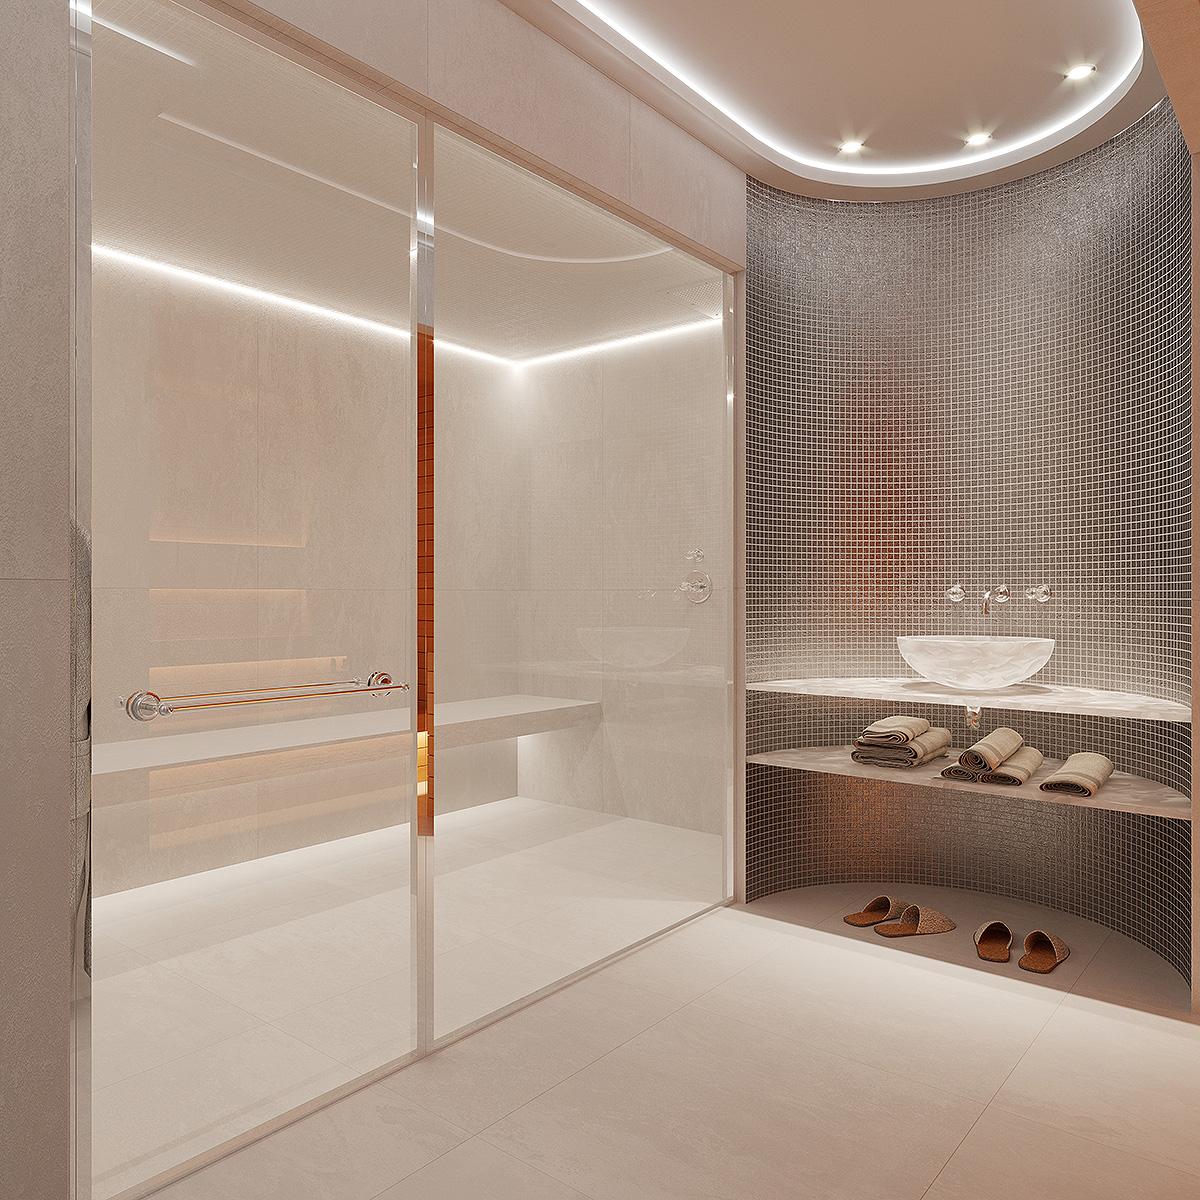 Ambiance spa de luxe by THG BATH CONCEPT